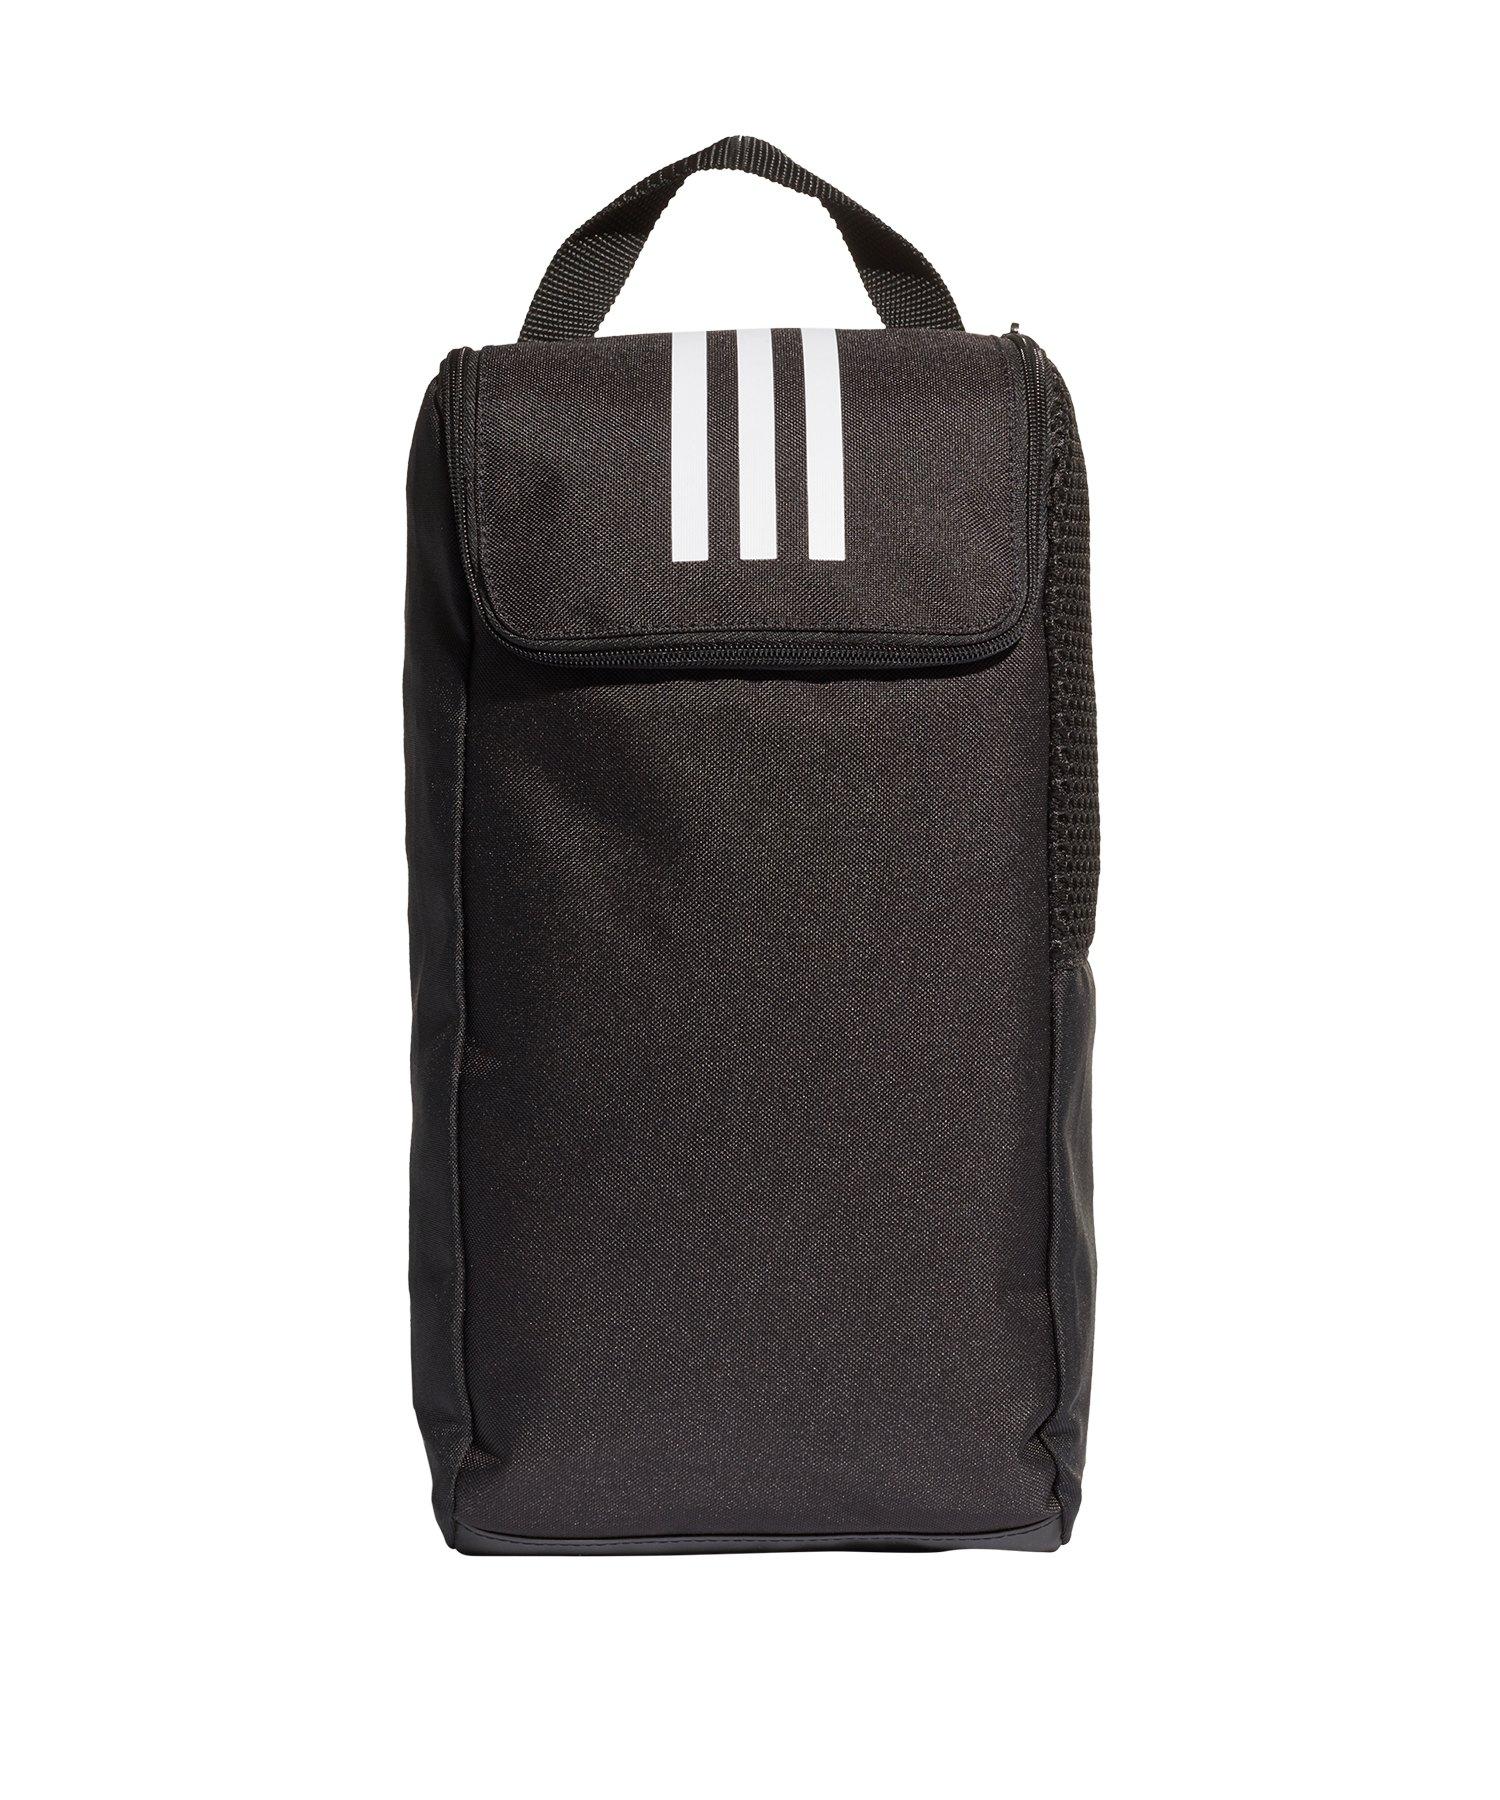 adidas Tiro Shoe Bag Schuhtasche Schwarz Weiss - schwarz